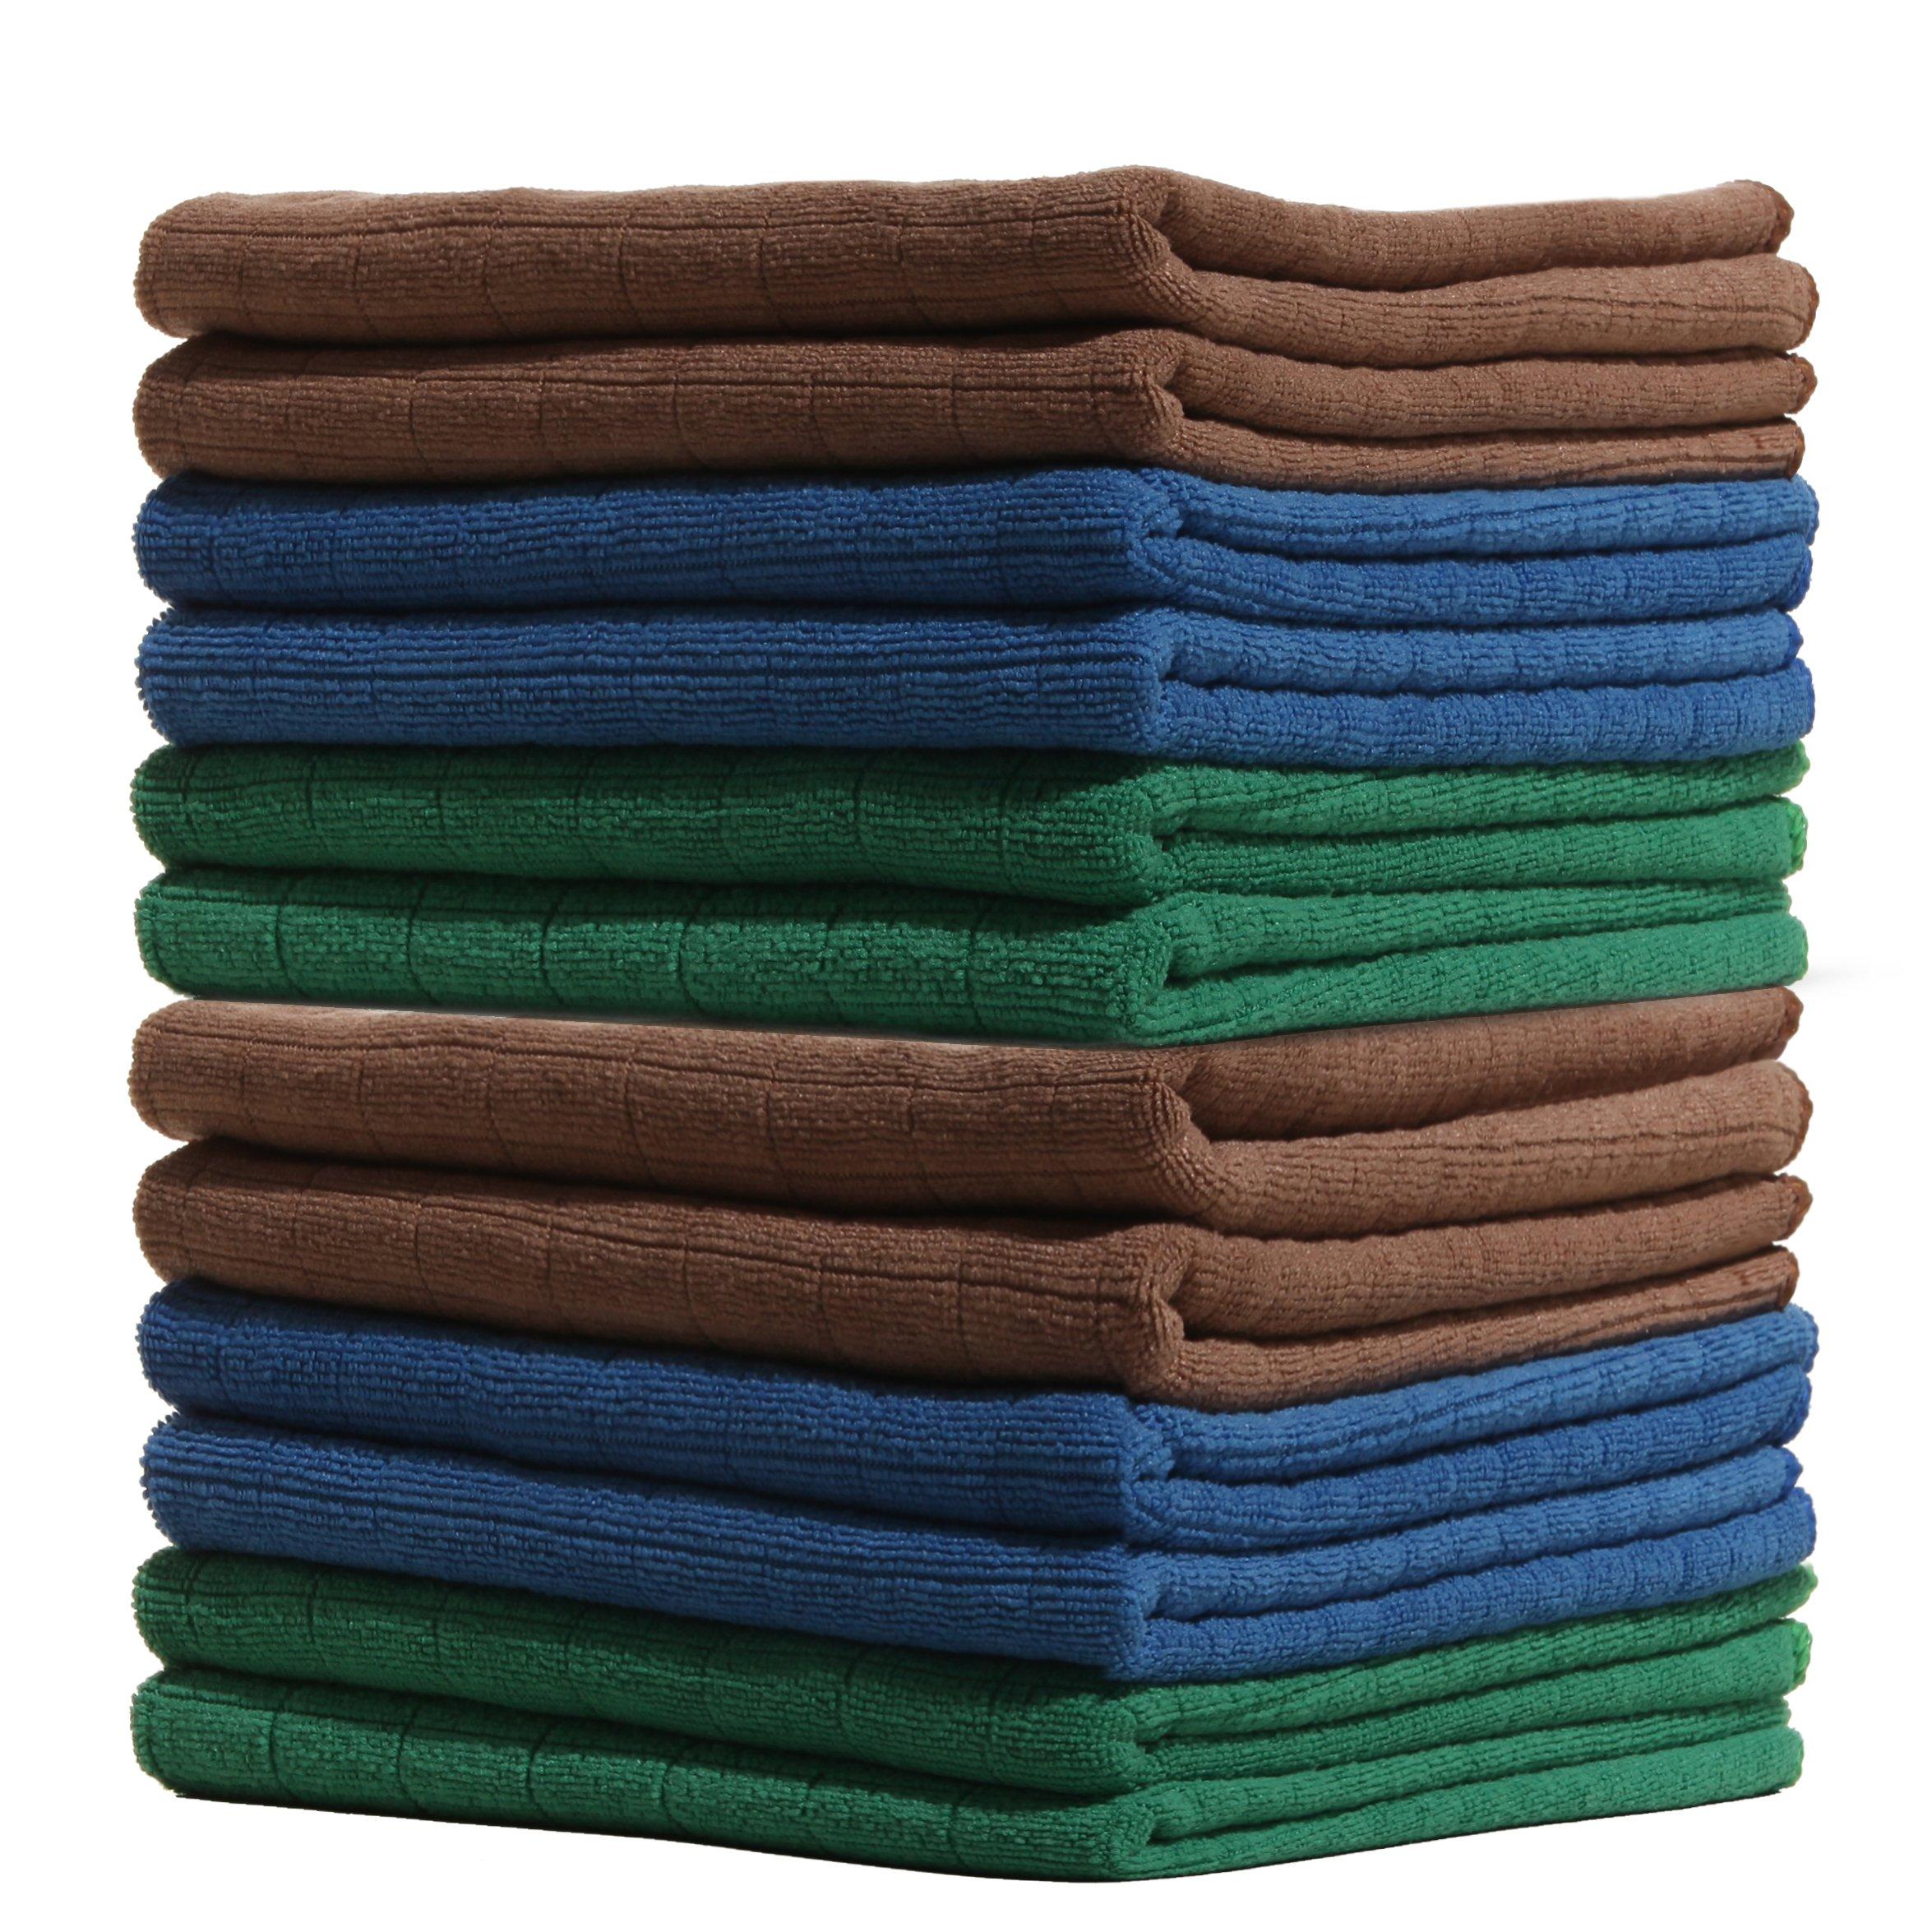 LUCKISS Windowpane Microfiber Kitchen Towels 12 Pack Super Soft Ultra Absorbent Quick Drying Dish Tea Towels Lint Streak Free Kitchen Bar Mop Cleaning Dust Cloths 15 x 25 Inch